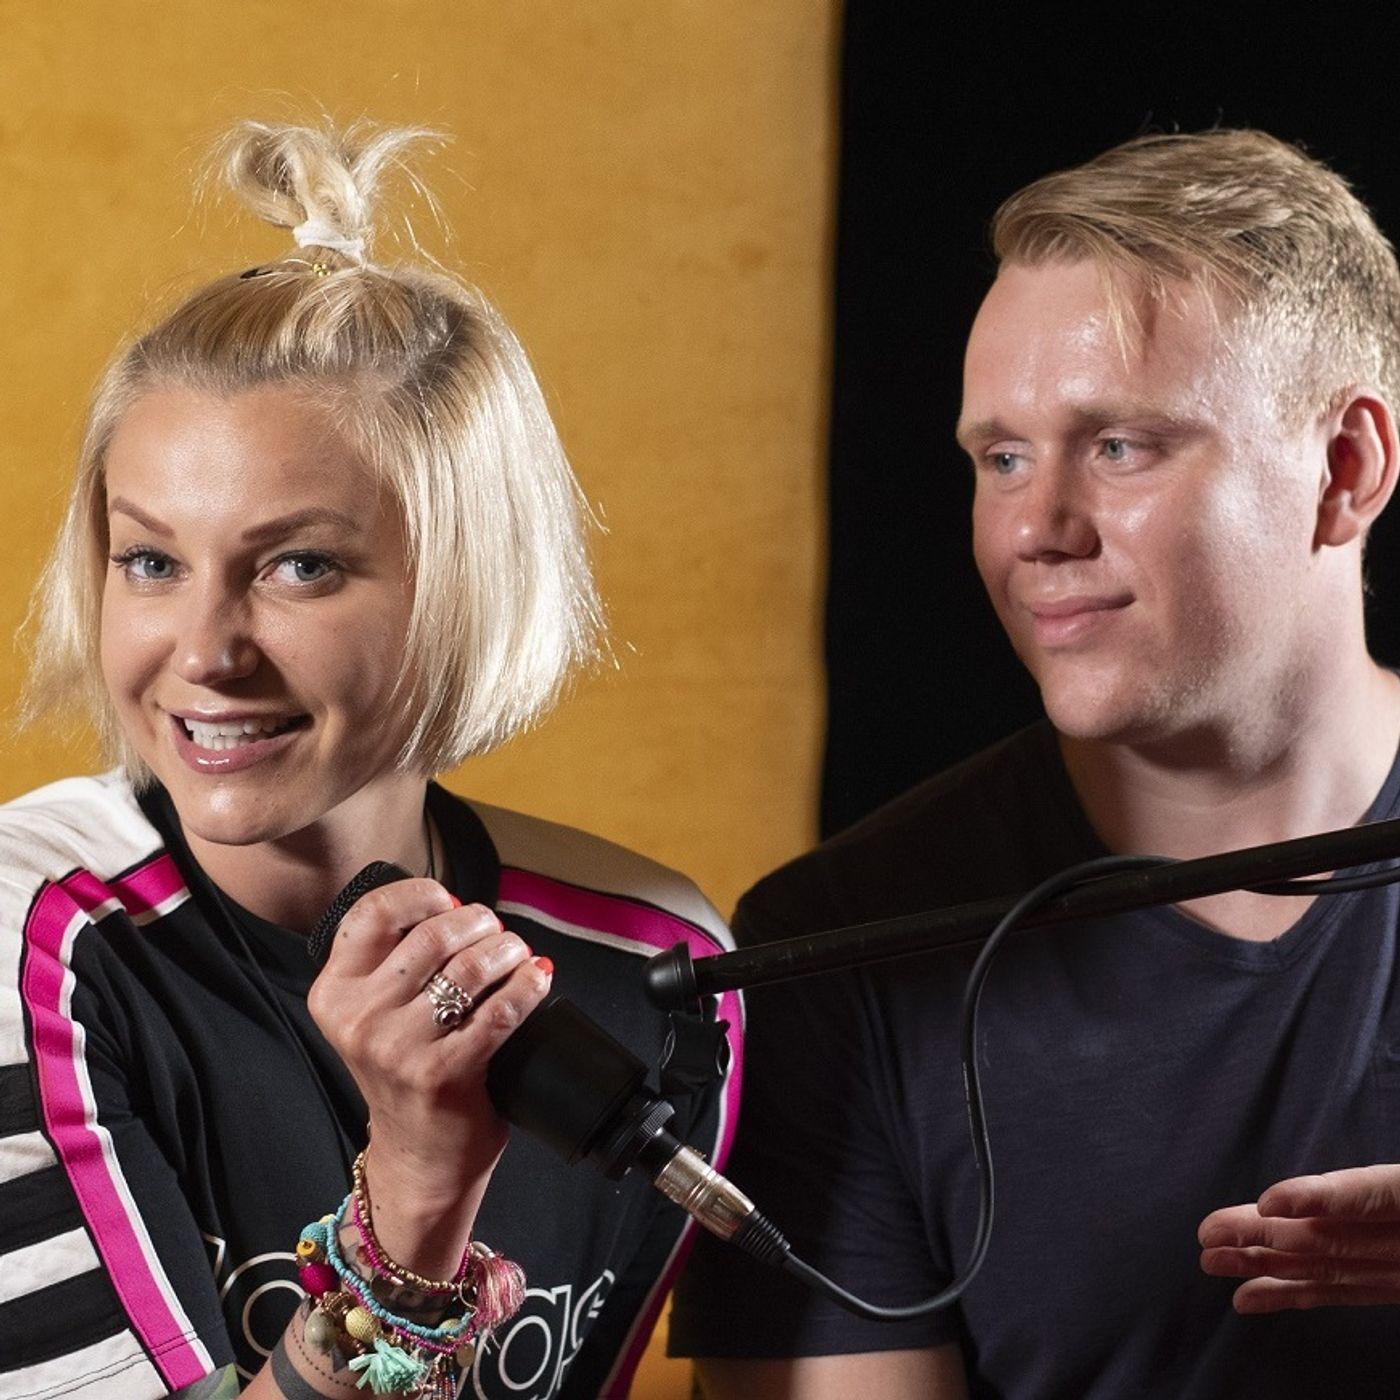 #8 Daria Ładocha - dziennikarka, coach żywienia, blogerka kulinarna